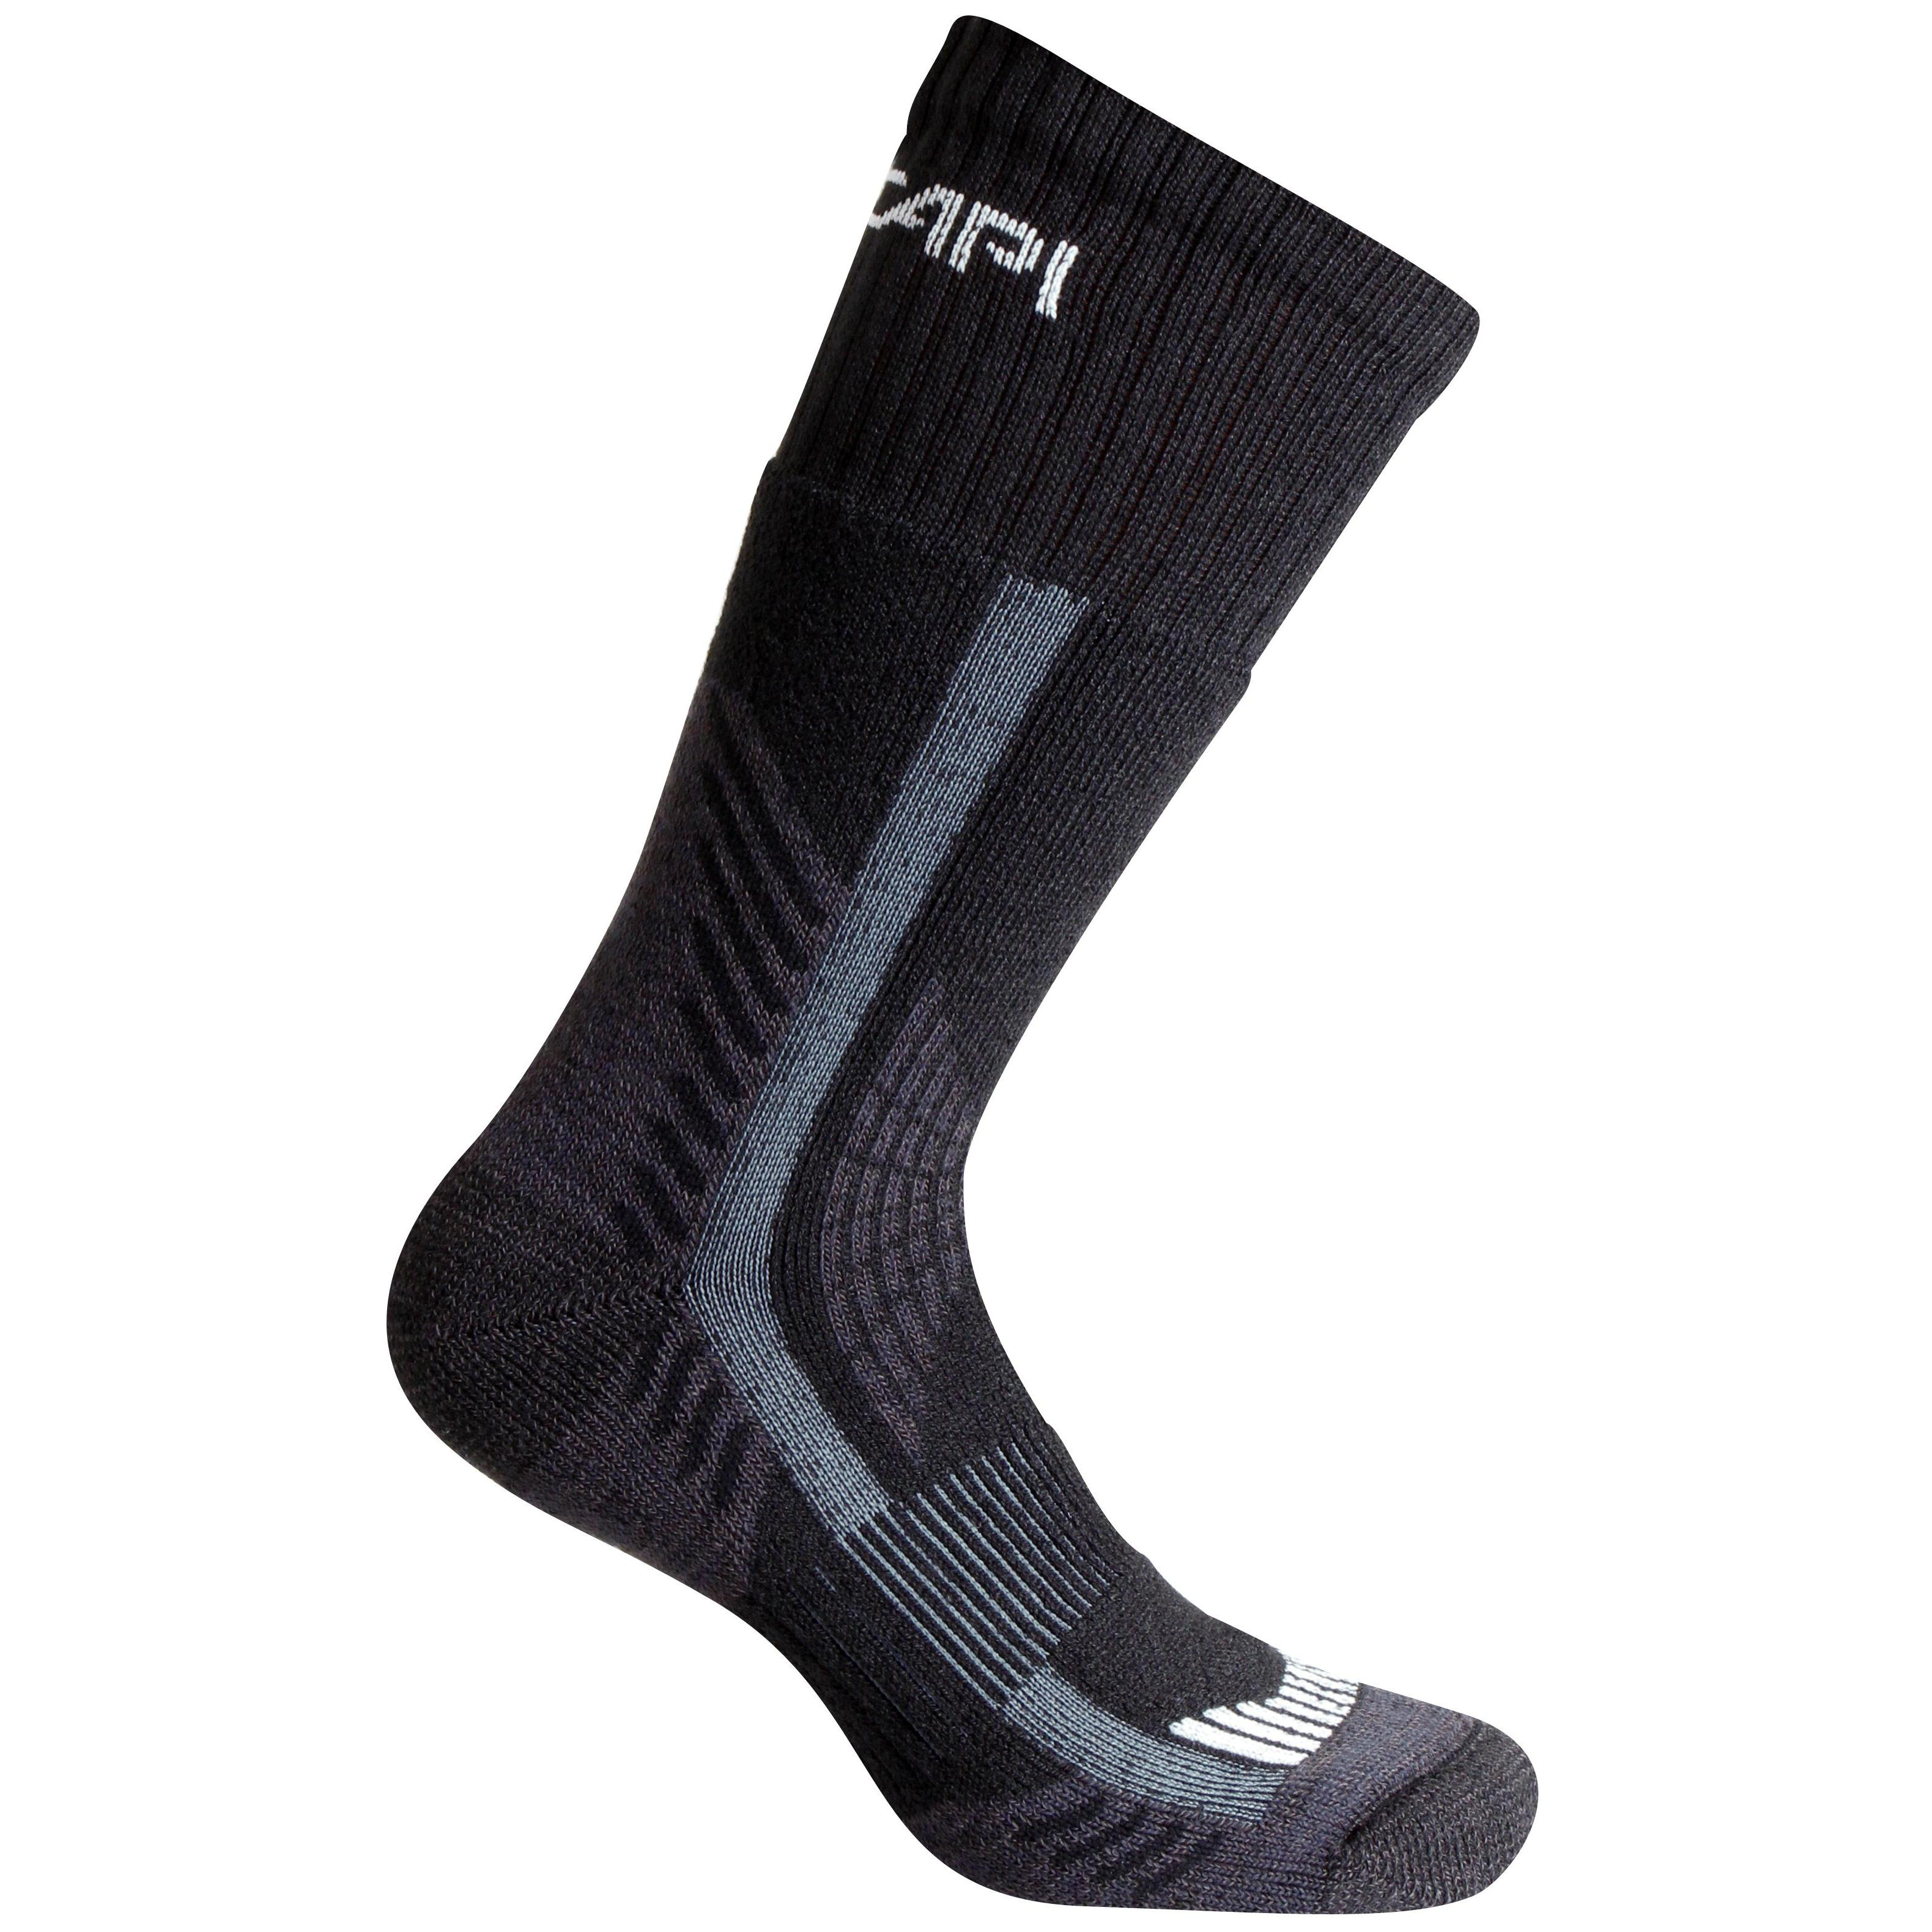 Носки Accapi Socks Trekking Thermic - Short, black/anthracite, 34-36 EU